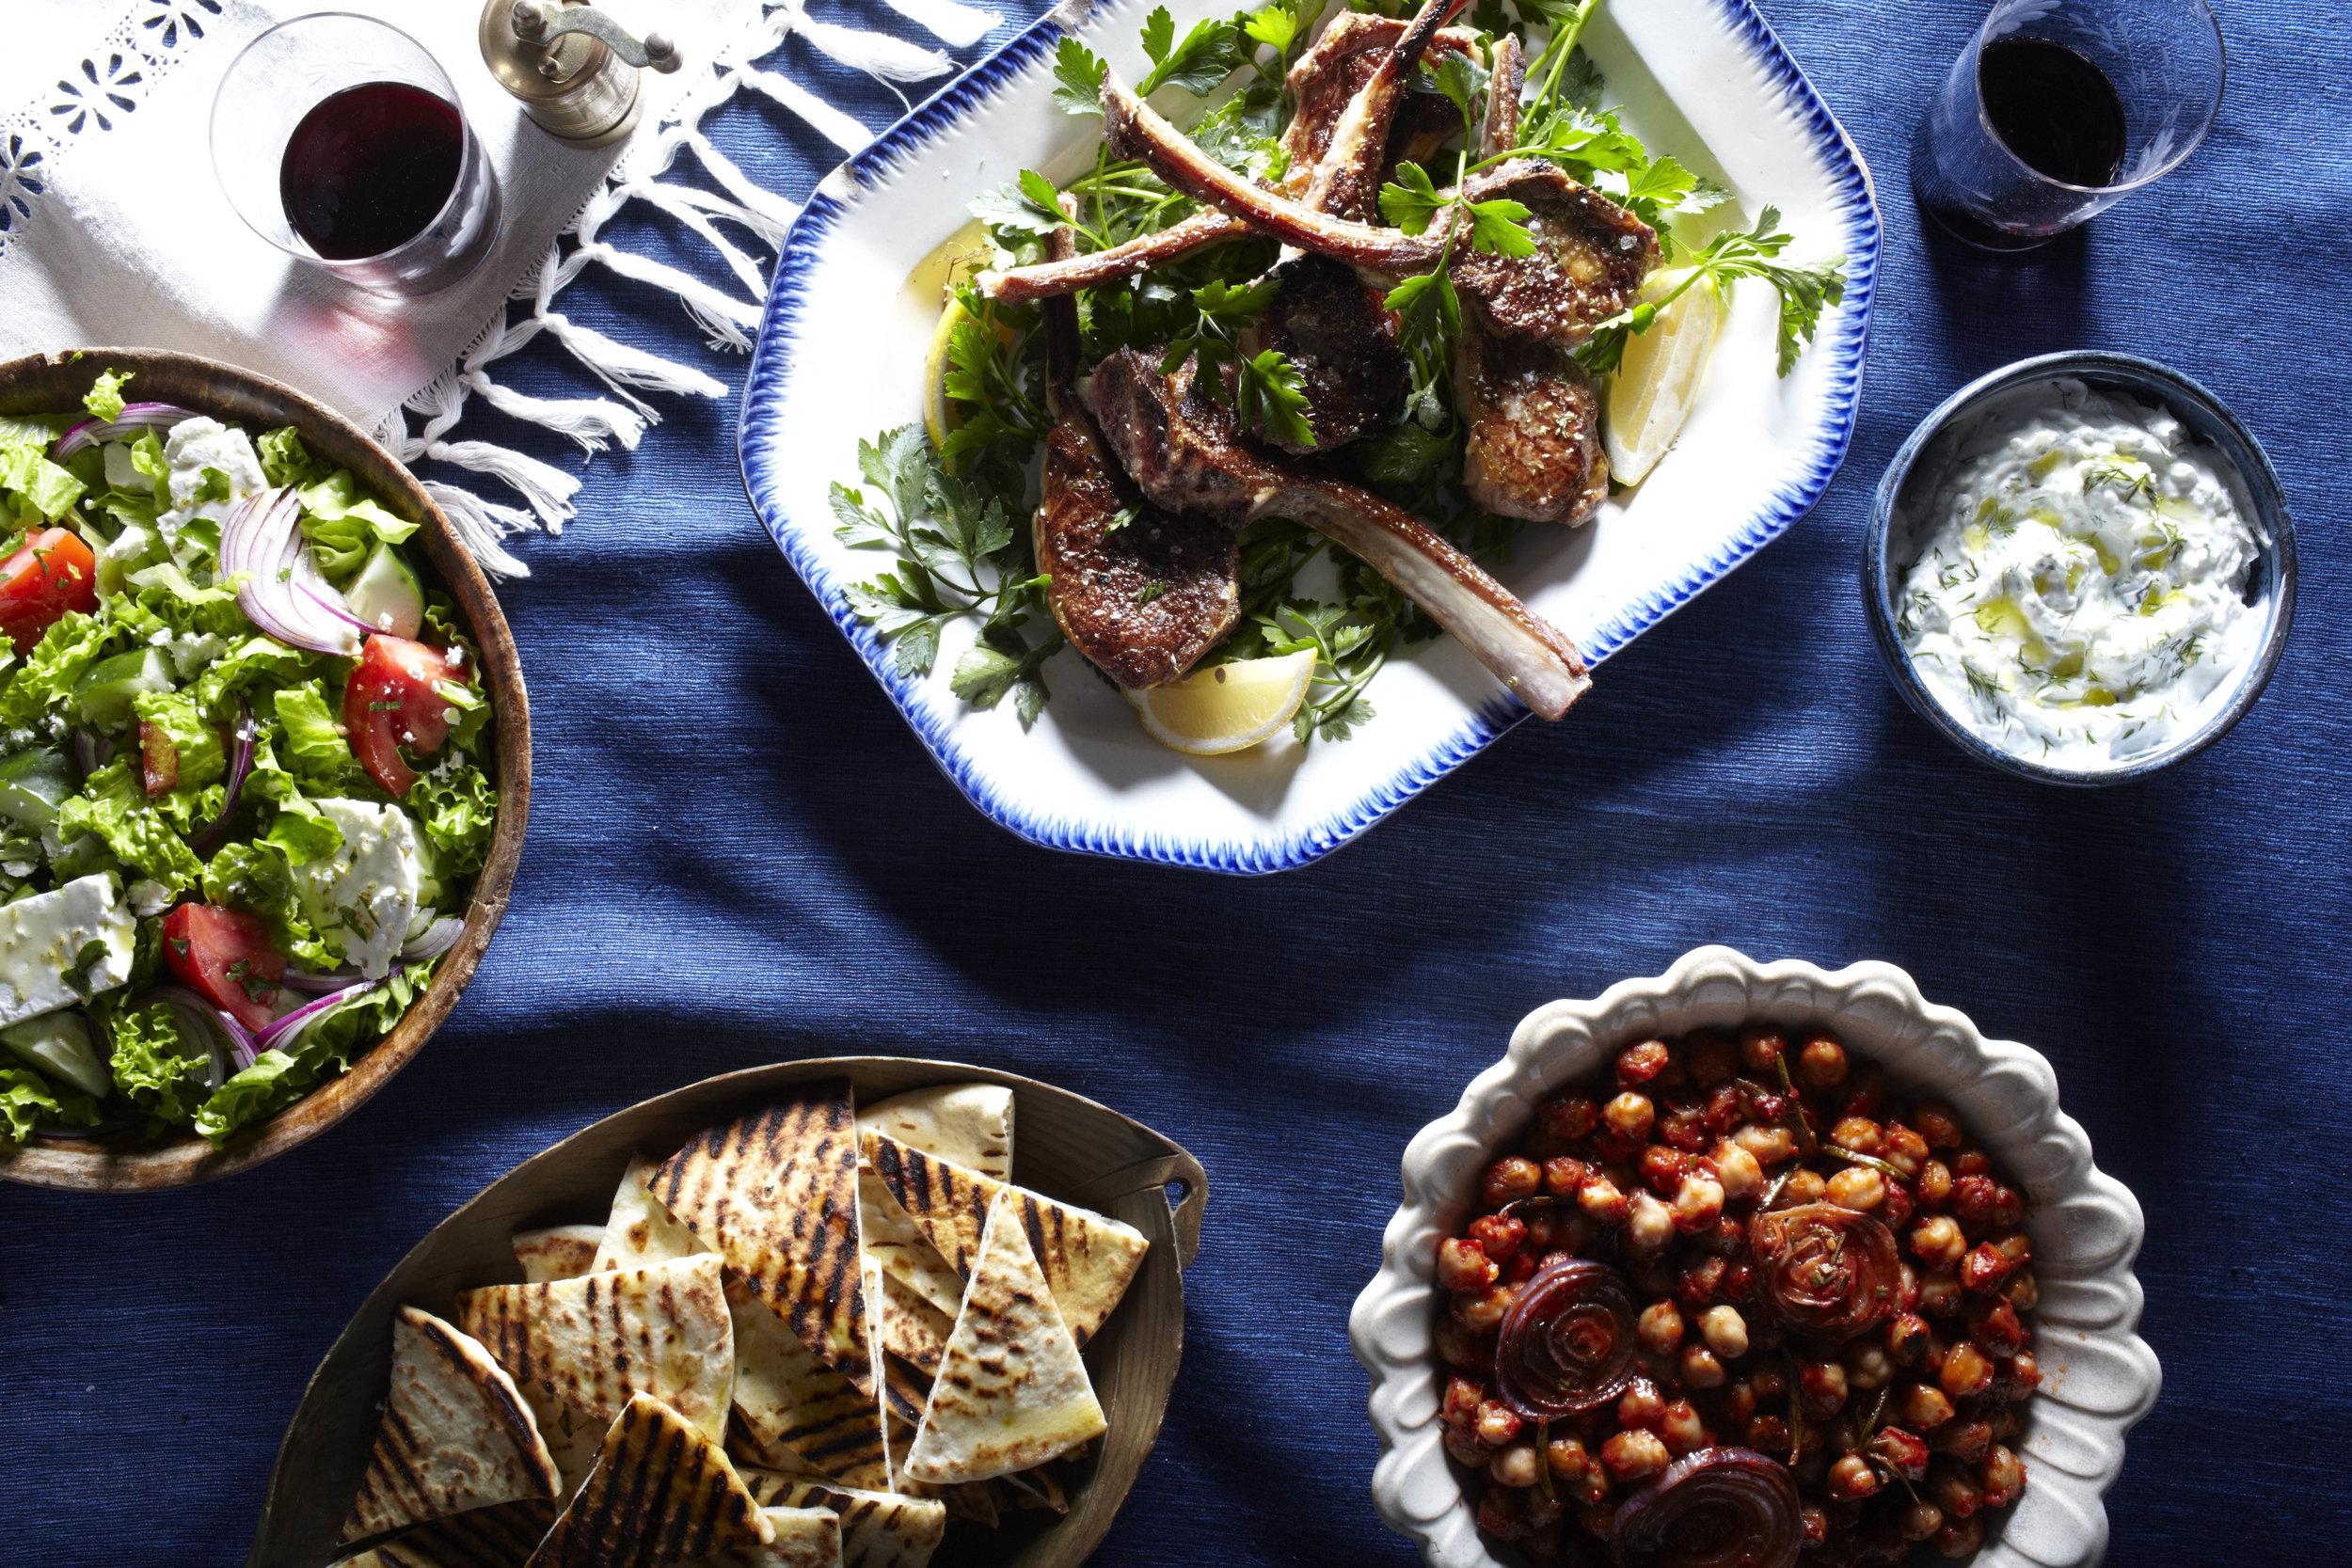 Test_Greek_Family_Style_Karin_Janine_Karin 5000.jpg